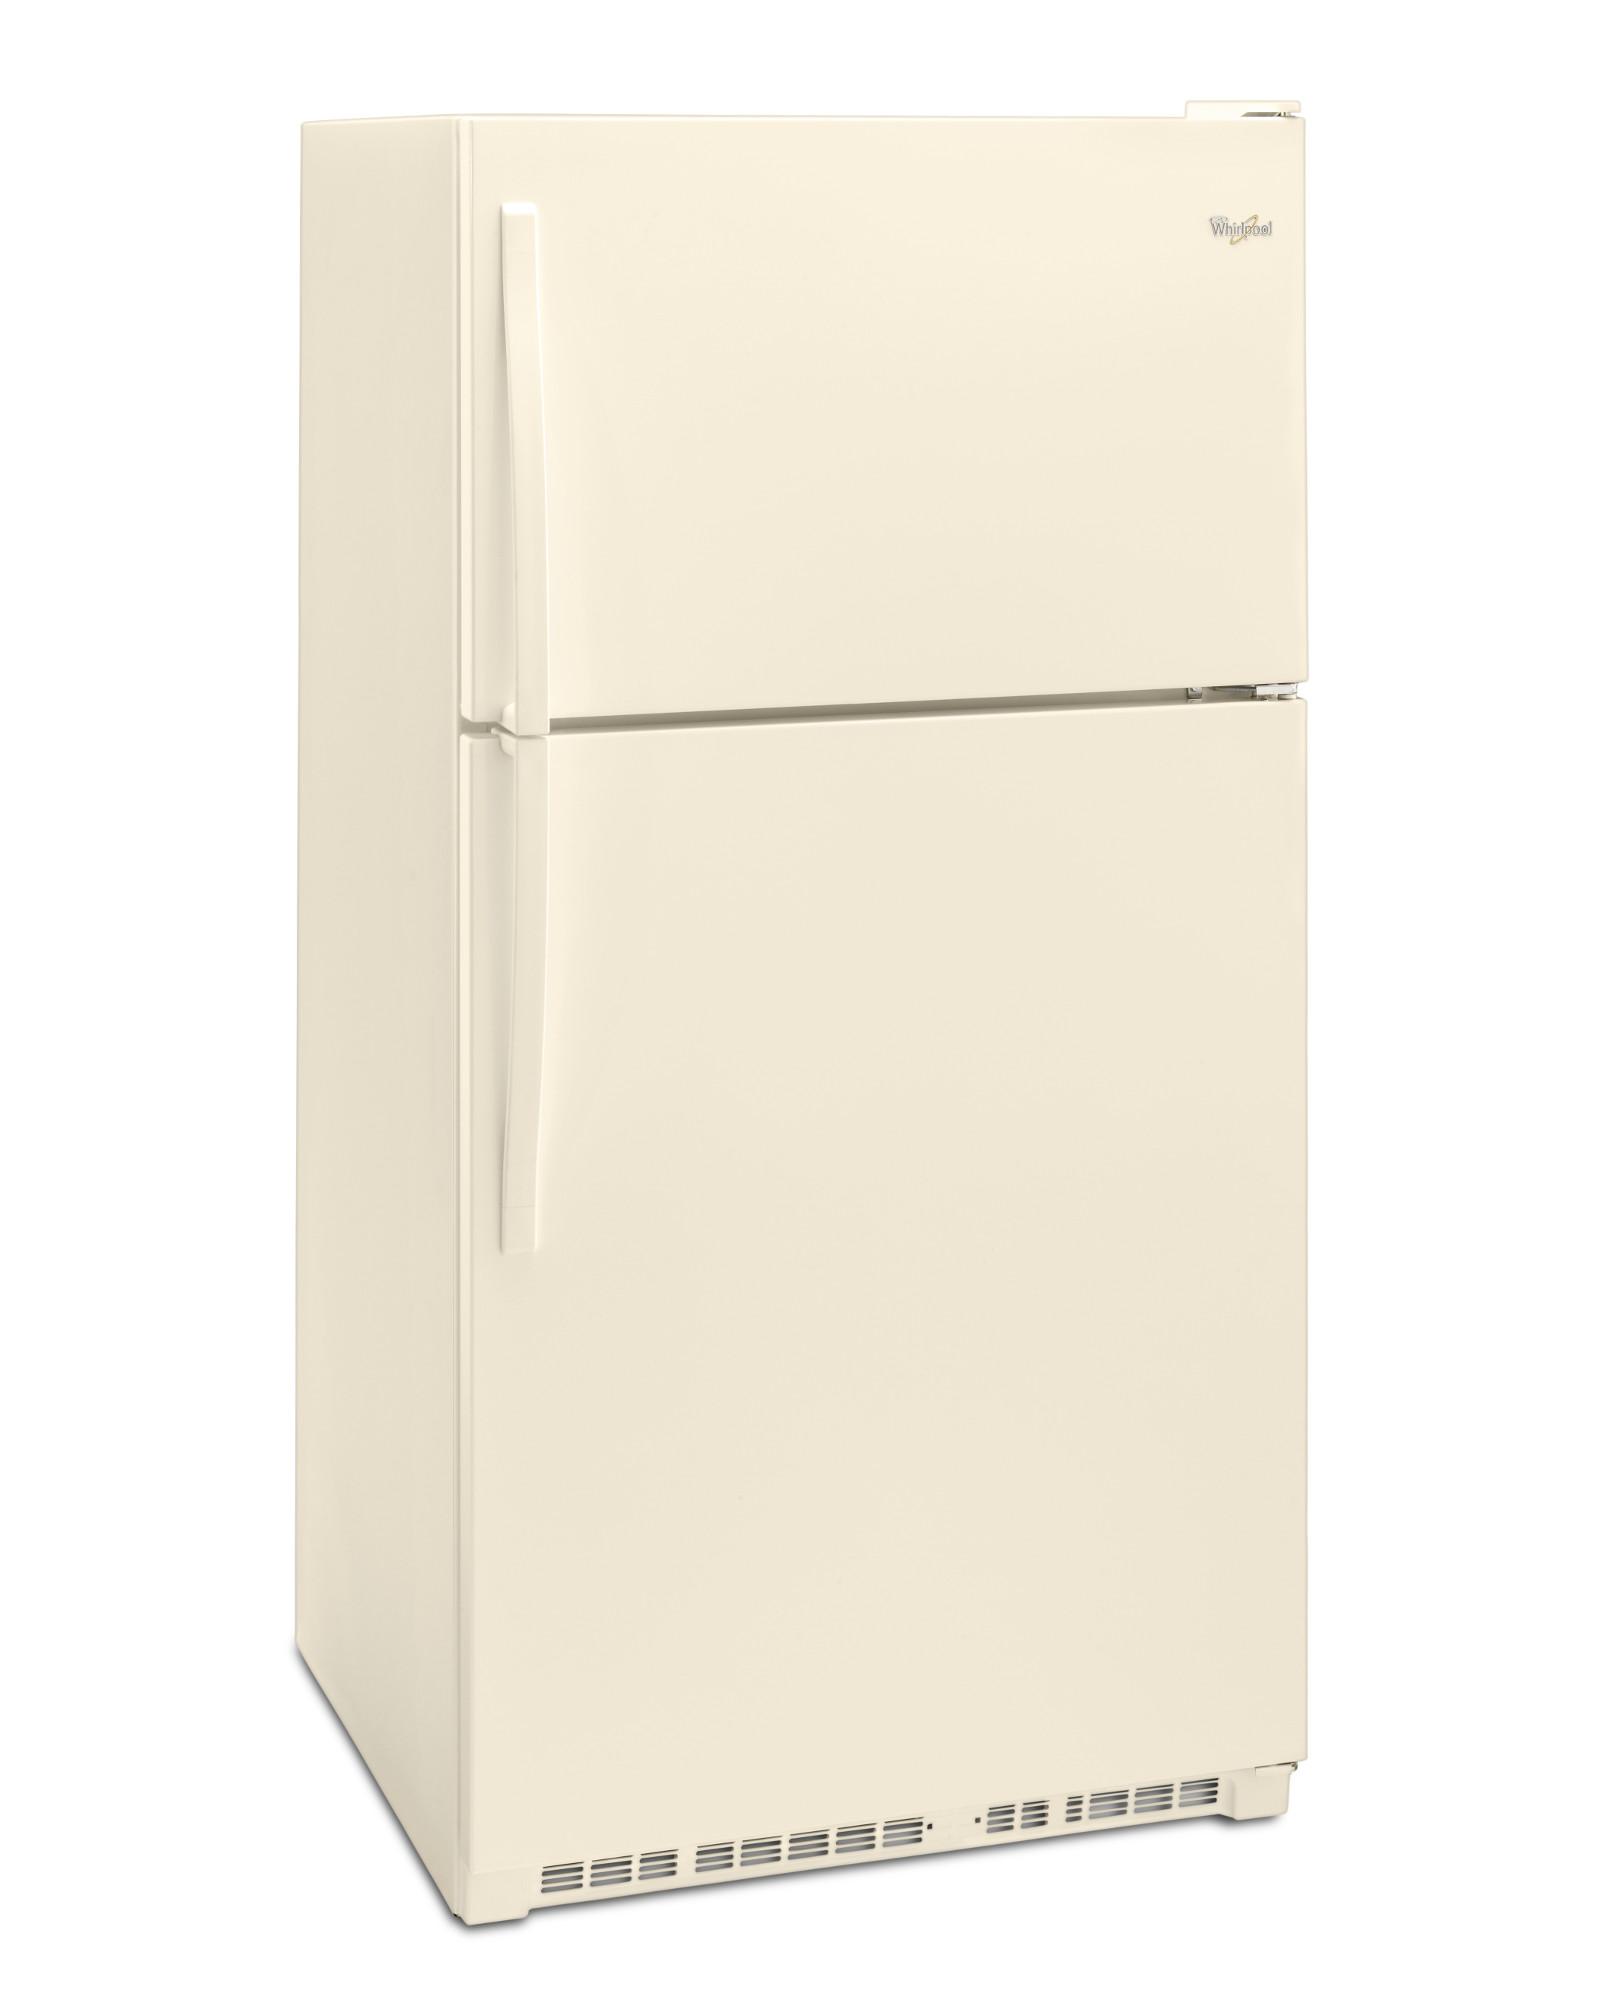 Whirlpool WRT311FZDT 20.5 cu. ft. Top Freezer Refrigerator - Biscuit